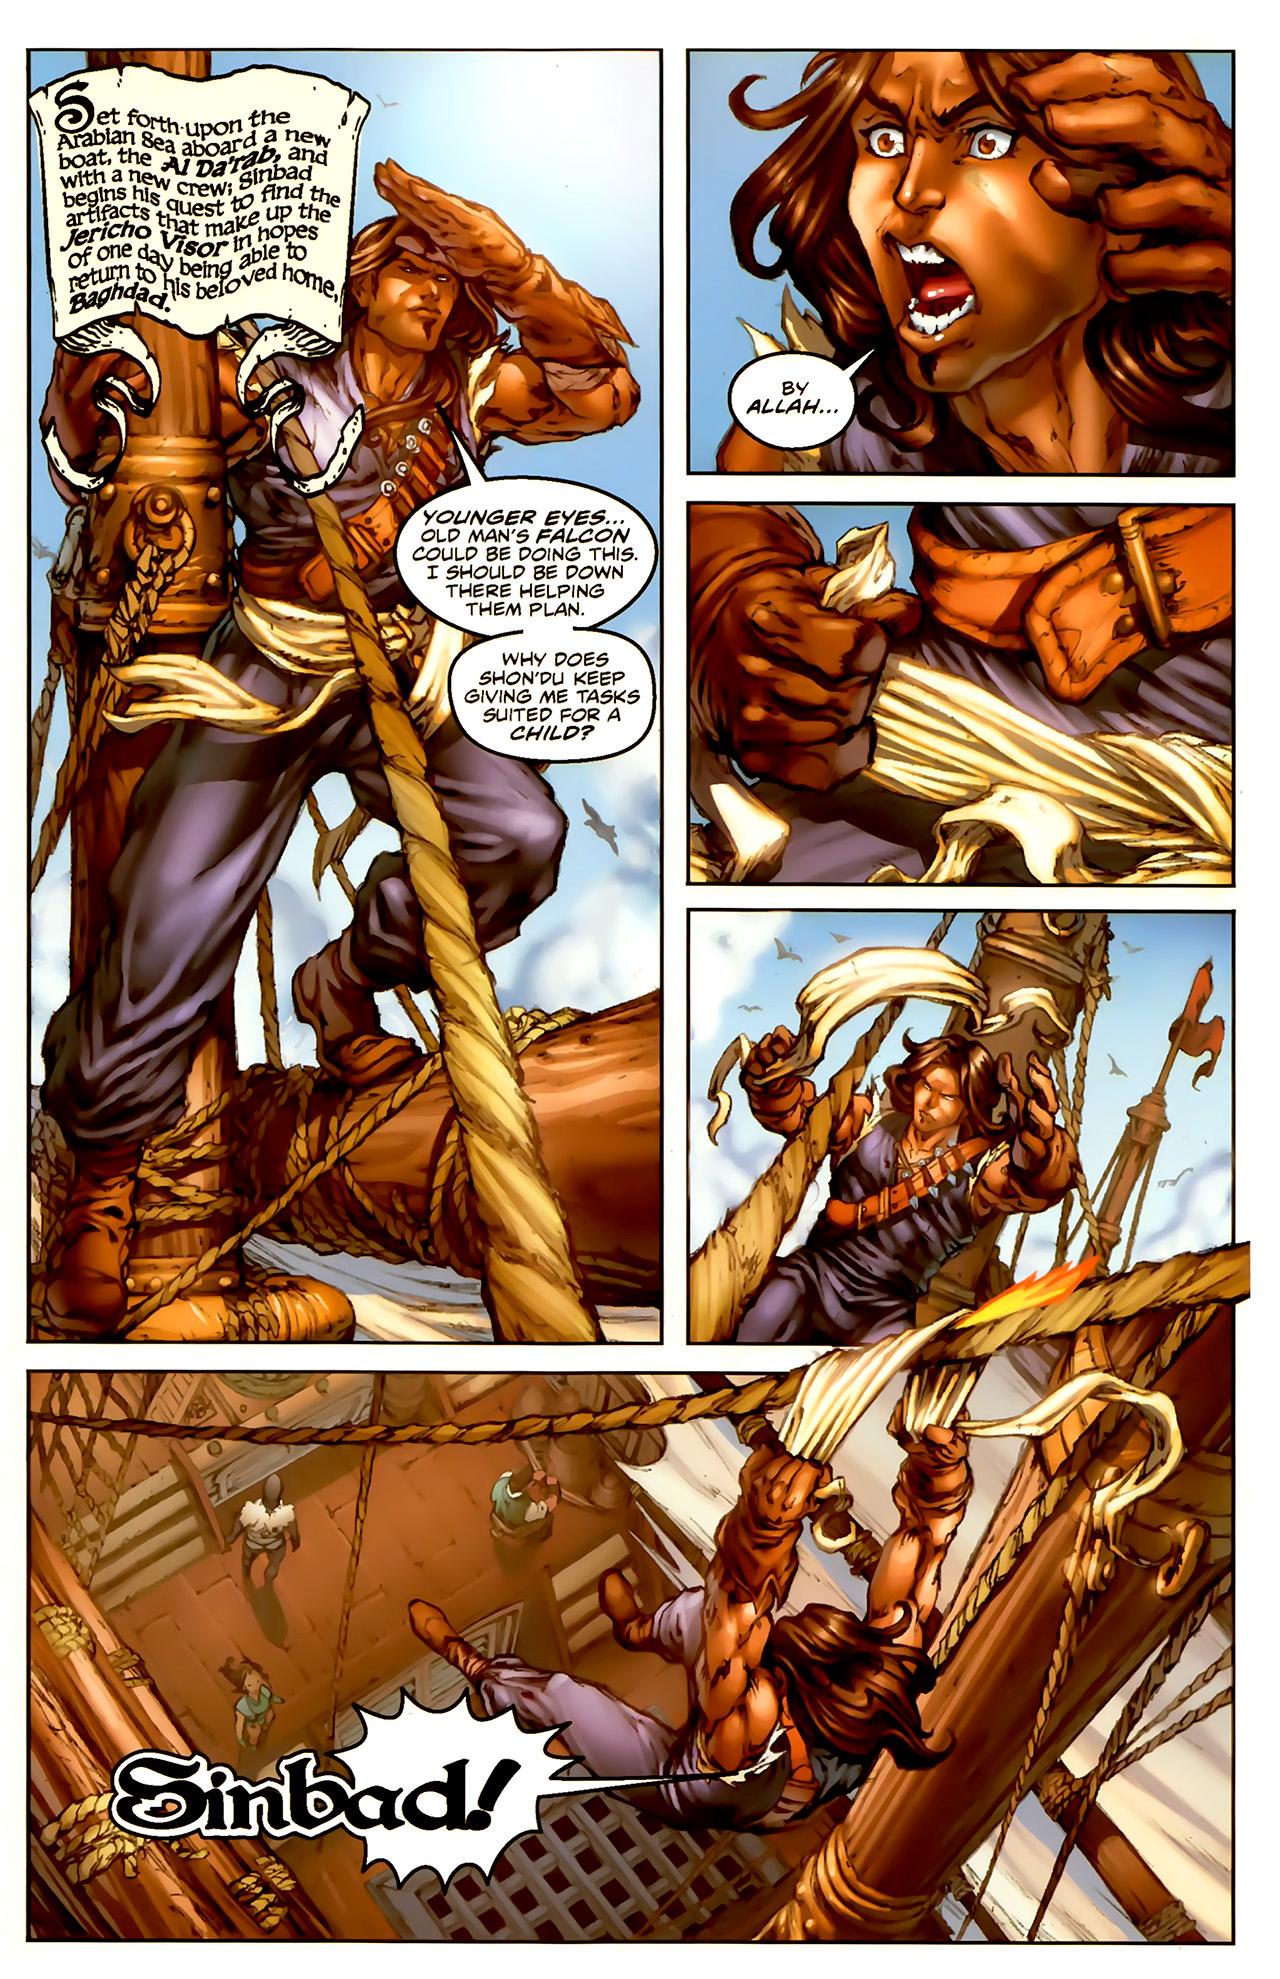 Read online 1001 Arabian Nights: The Adventures of Sinbad comic -  Issue #1 - 6